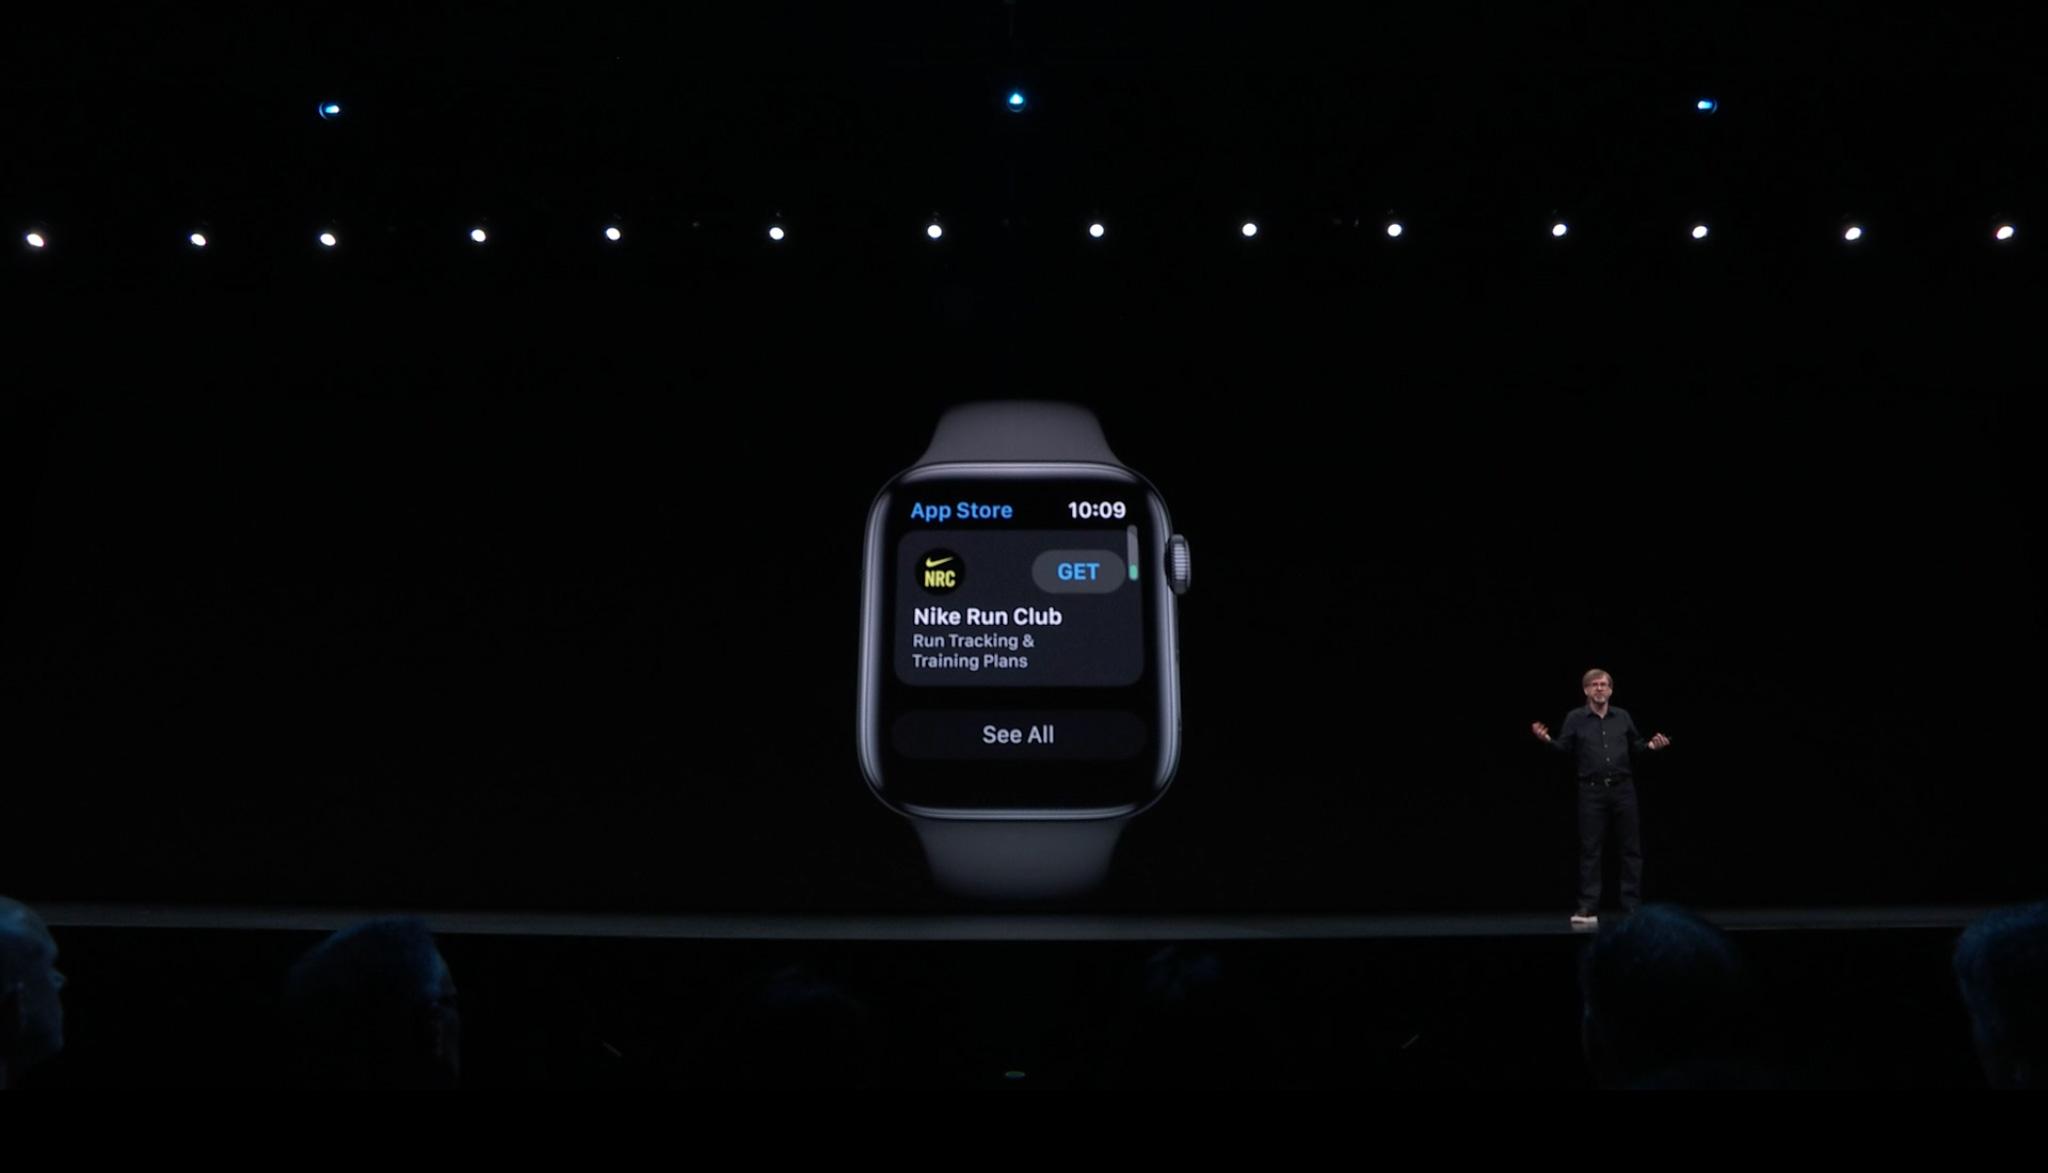 AppStore Apple Watch